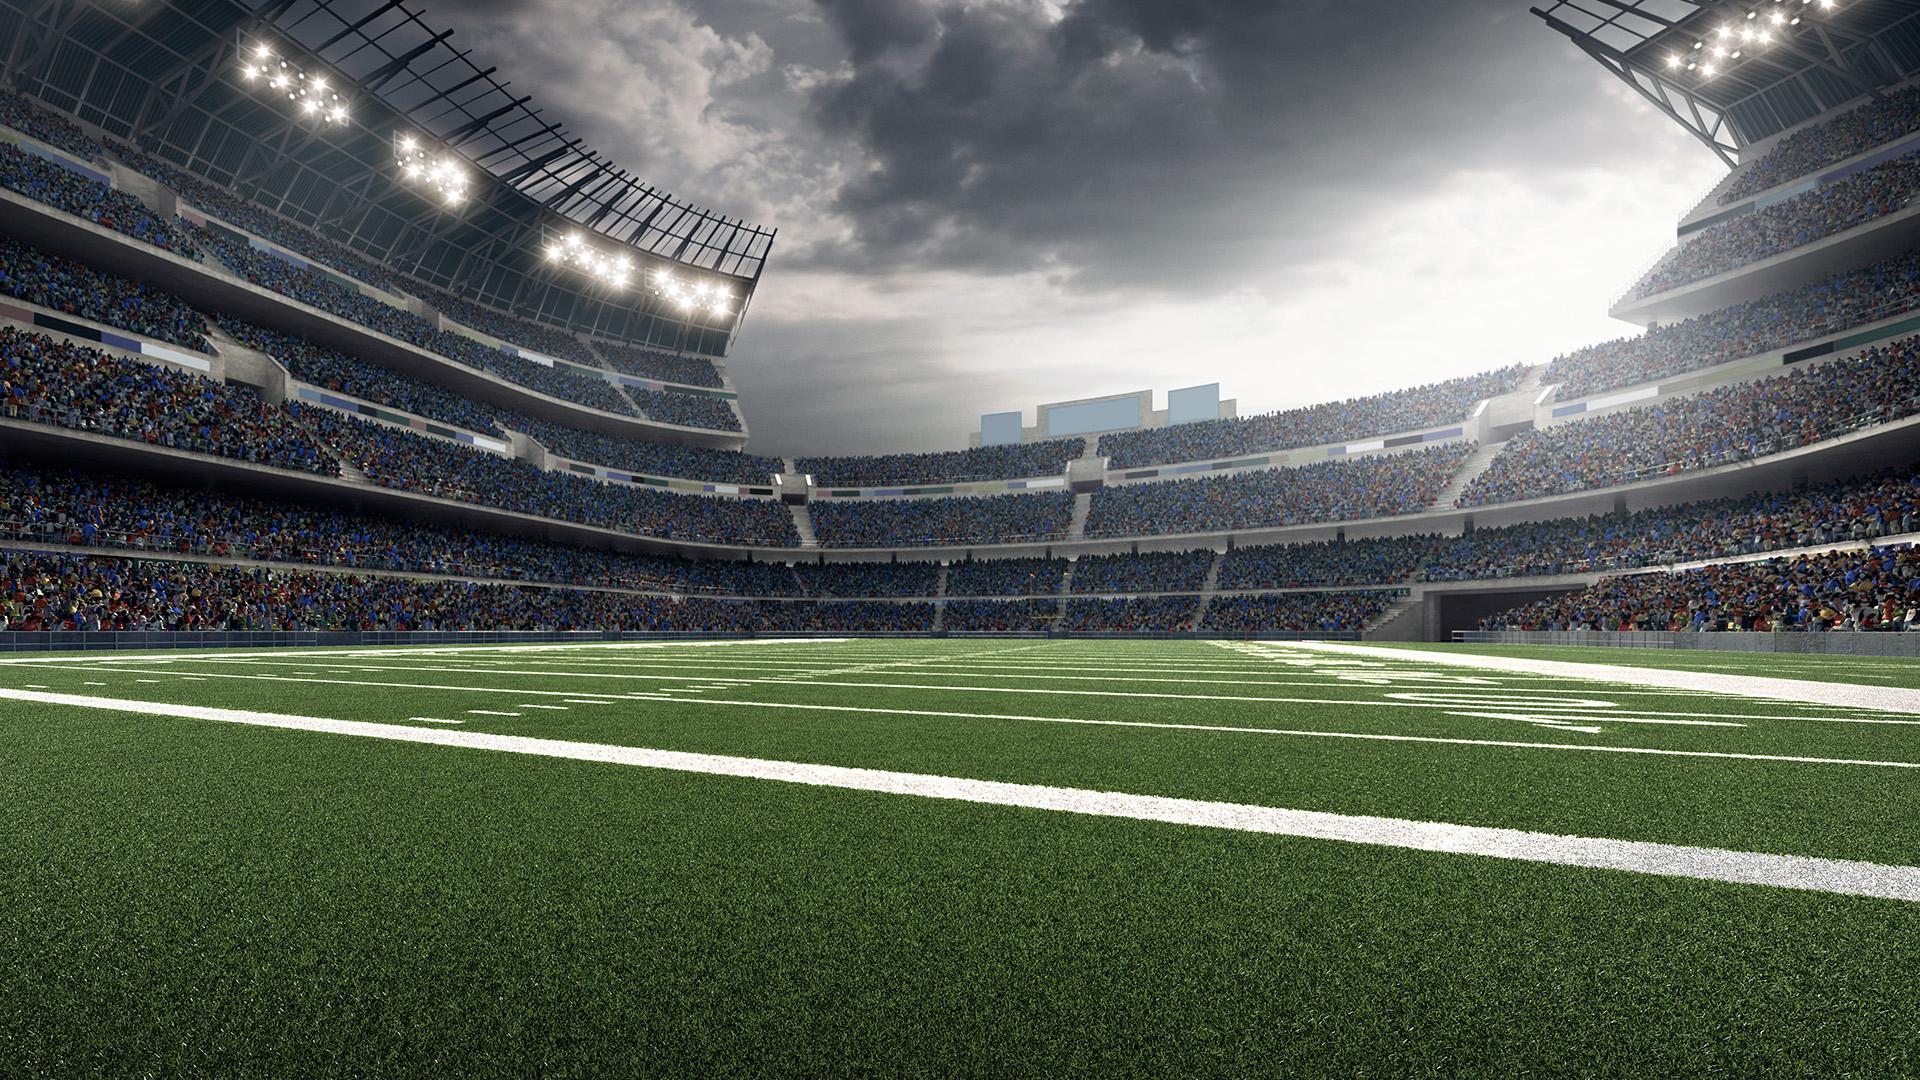 American football stadium | Windows 10 SpotLight Images